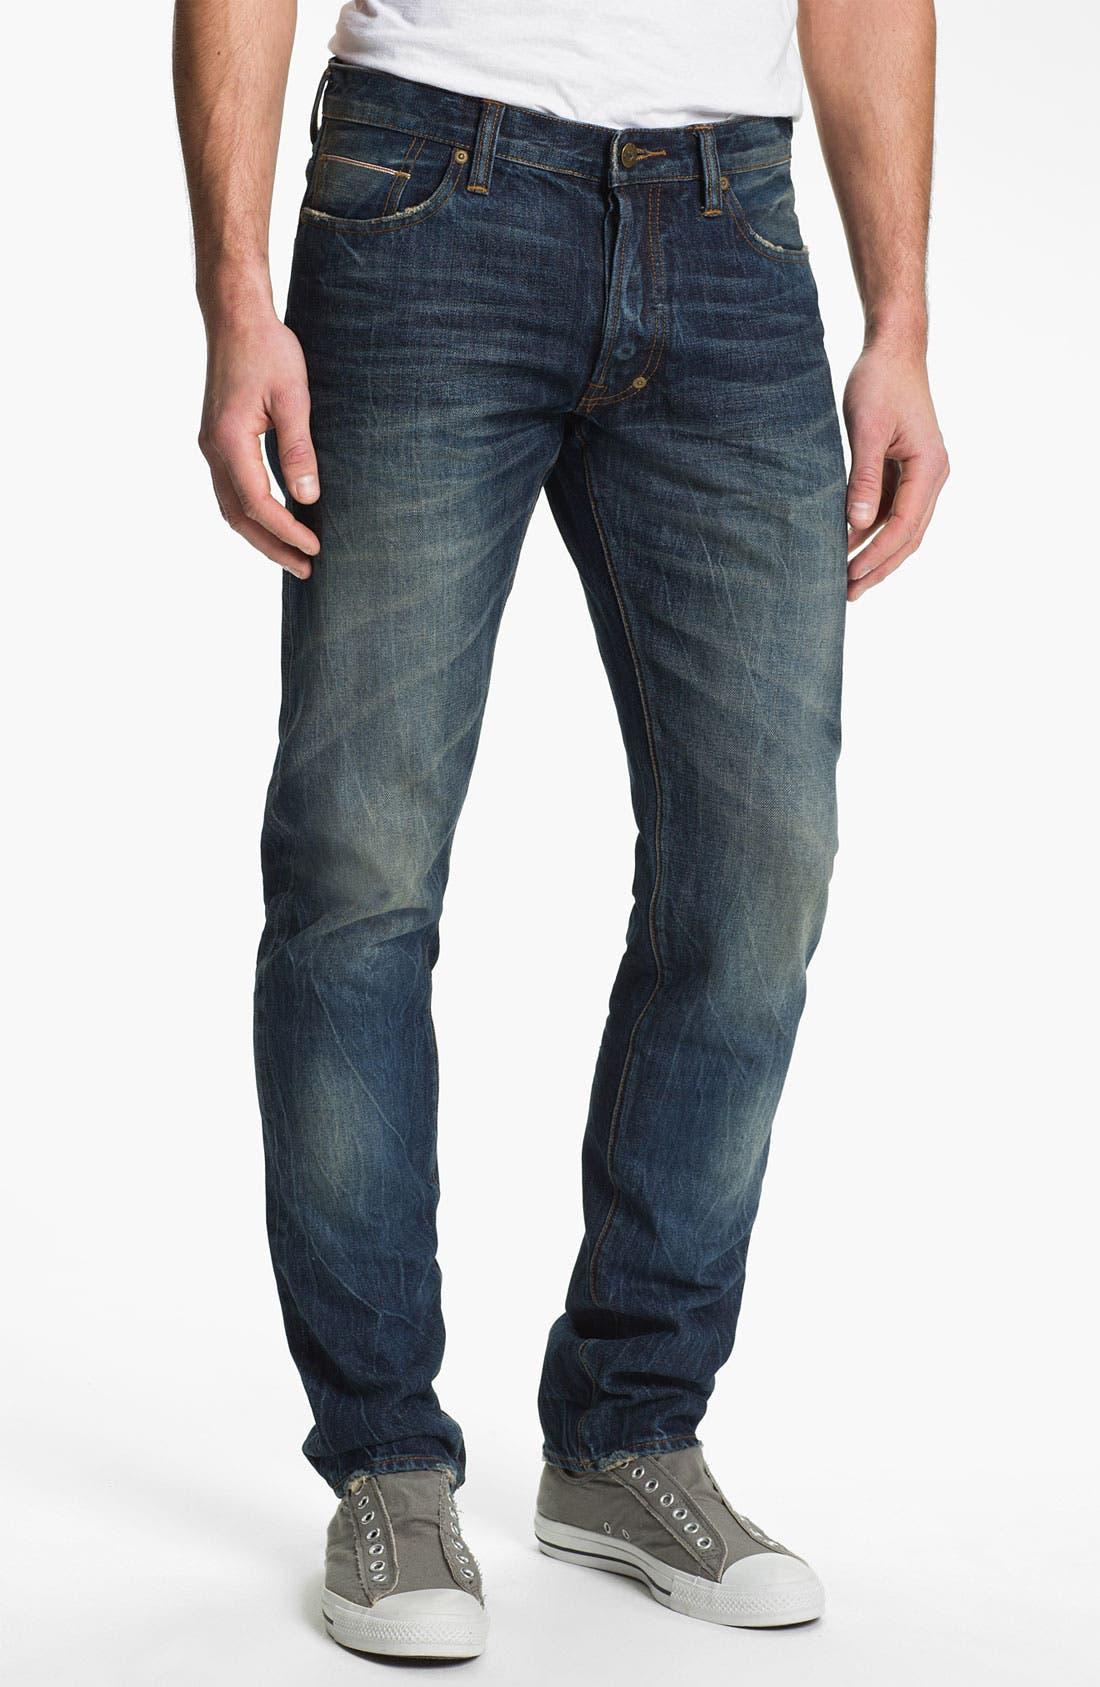 PRPS Barracuda Straight Leg Selvedge Jeans